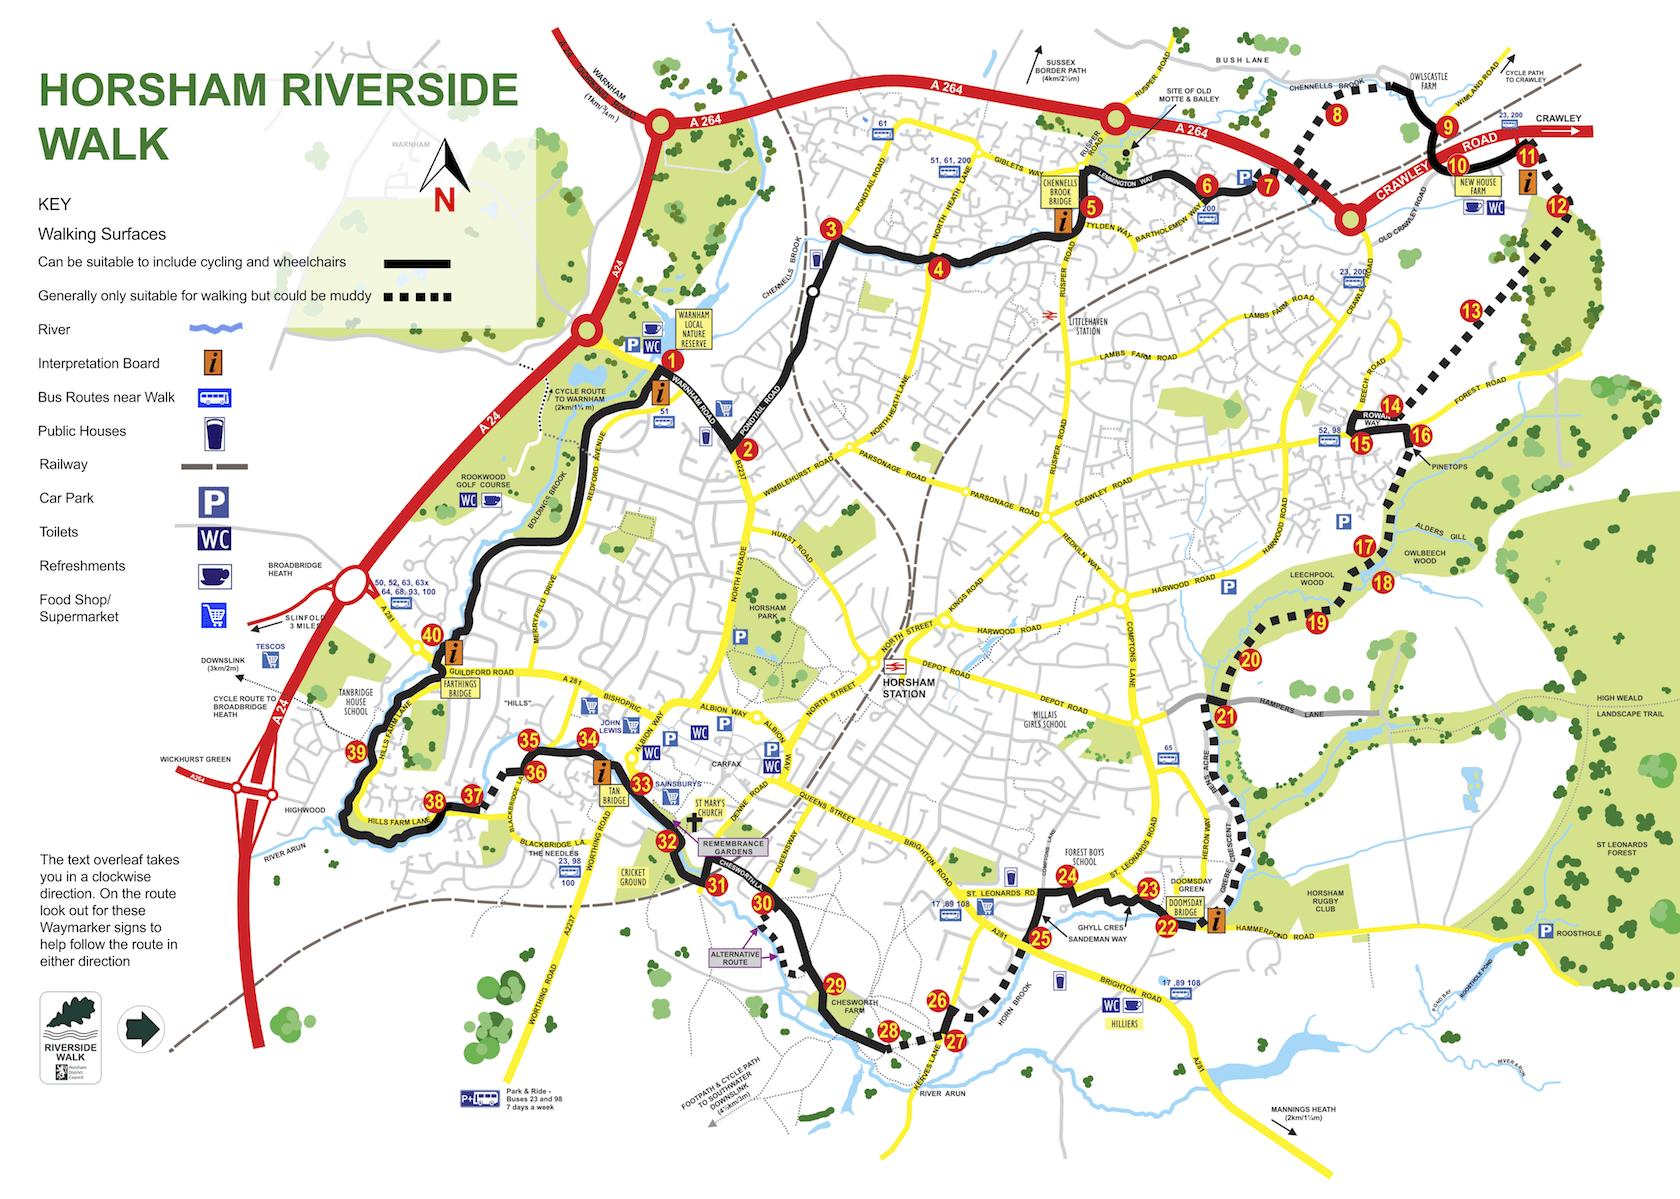 Horsham Riverside Walk Map 2018